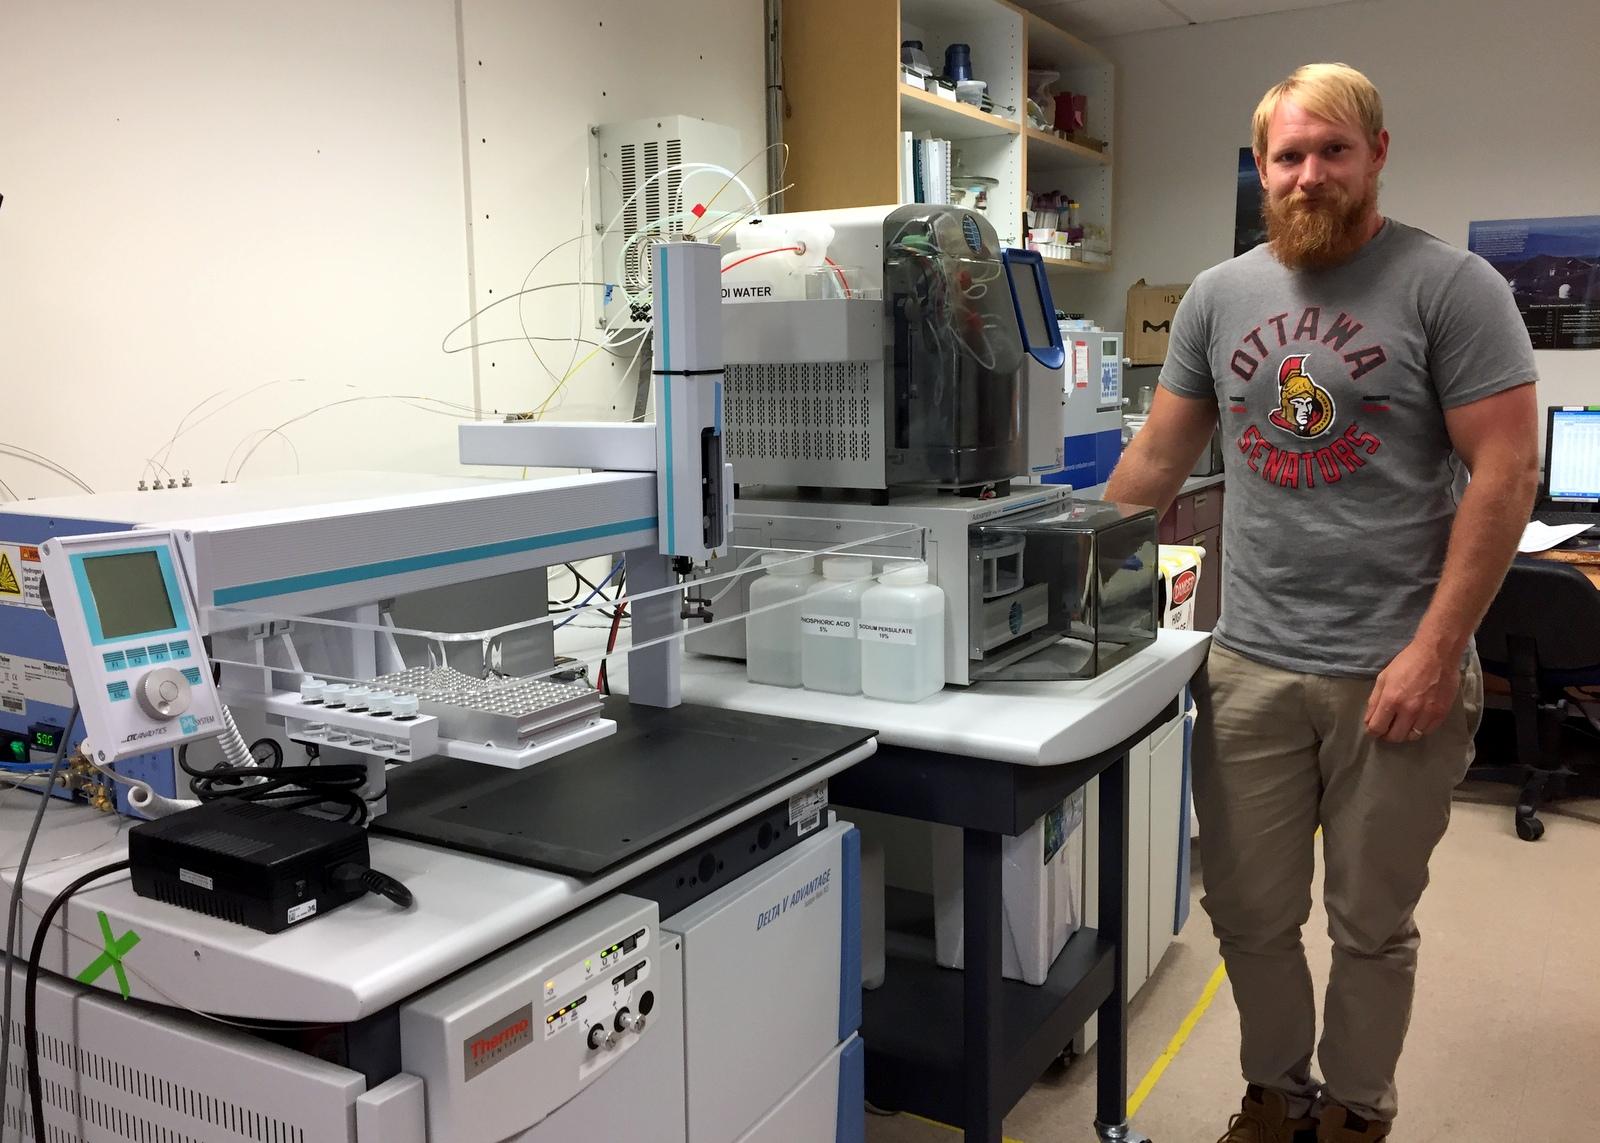 Erik Johnson stands next to the spectrometer.